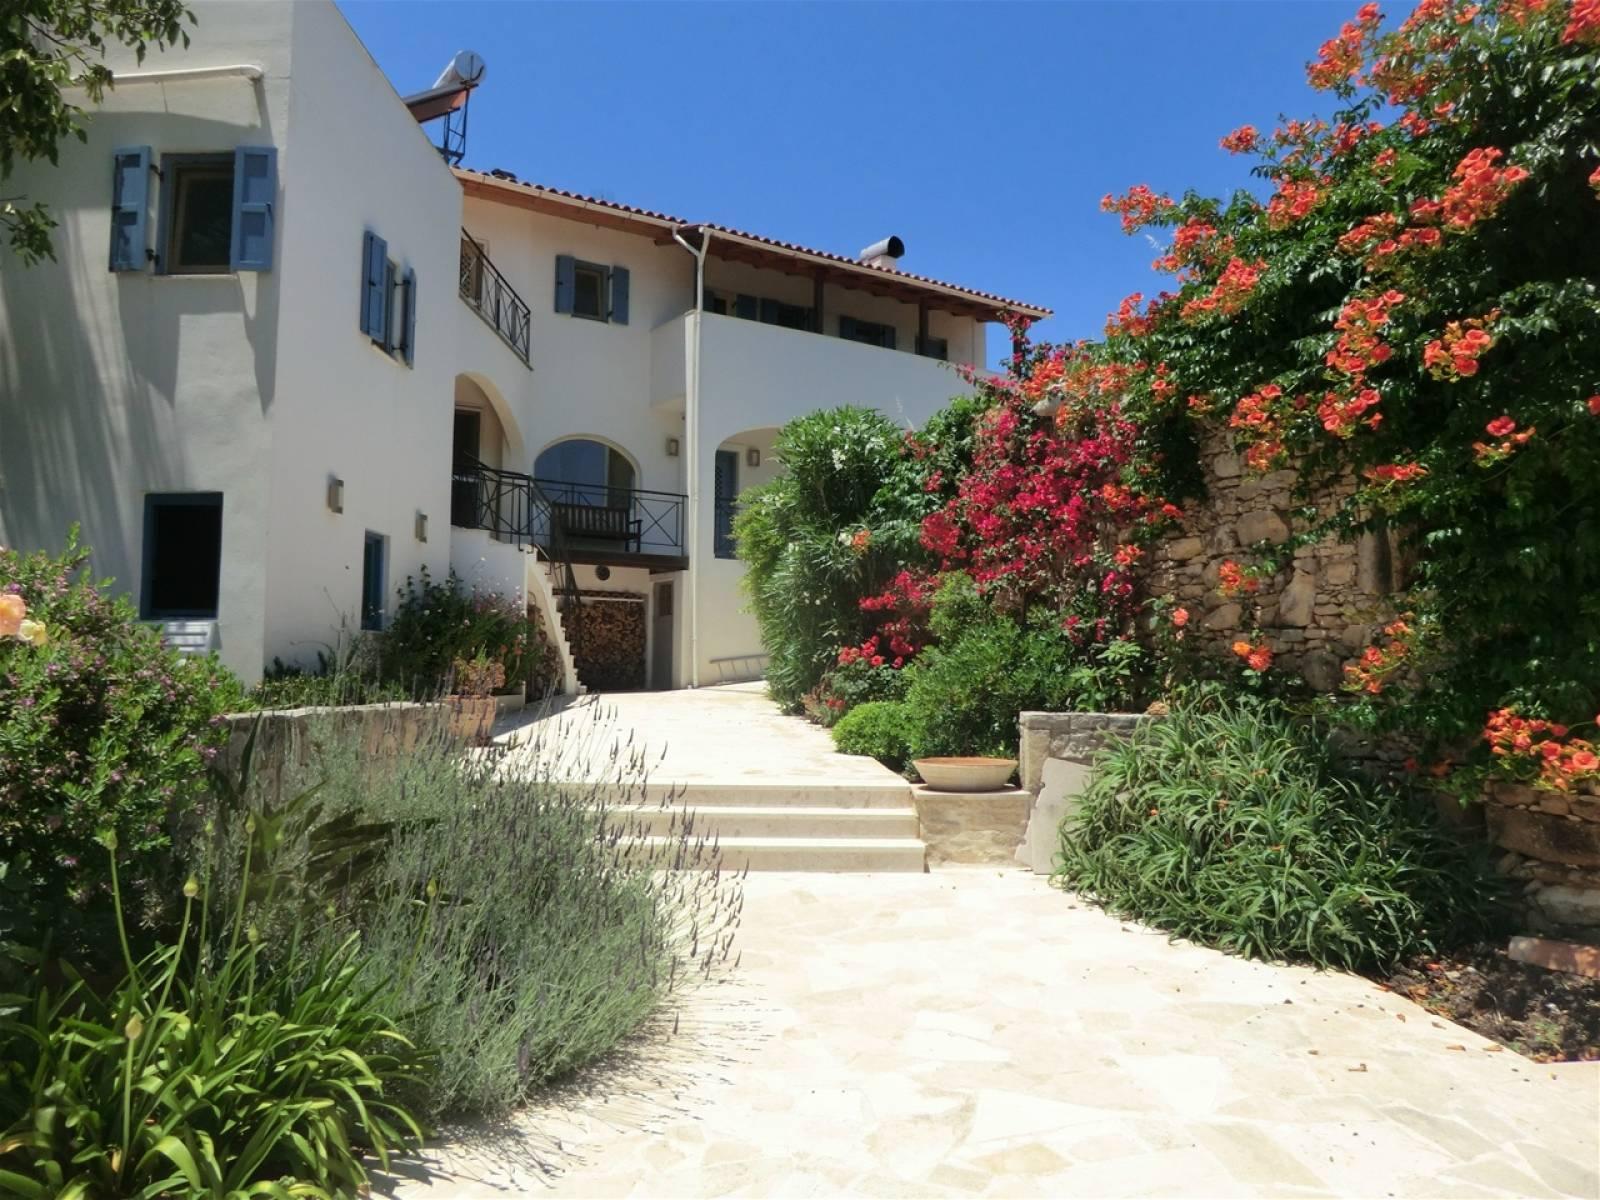 Villa with guest apartment in Kato Poros